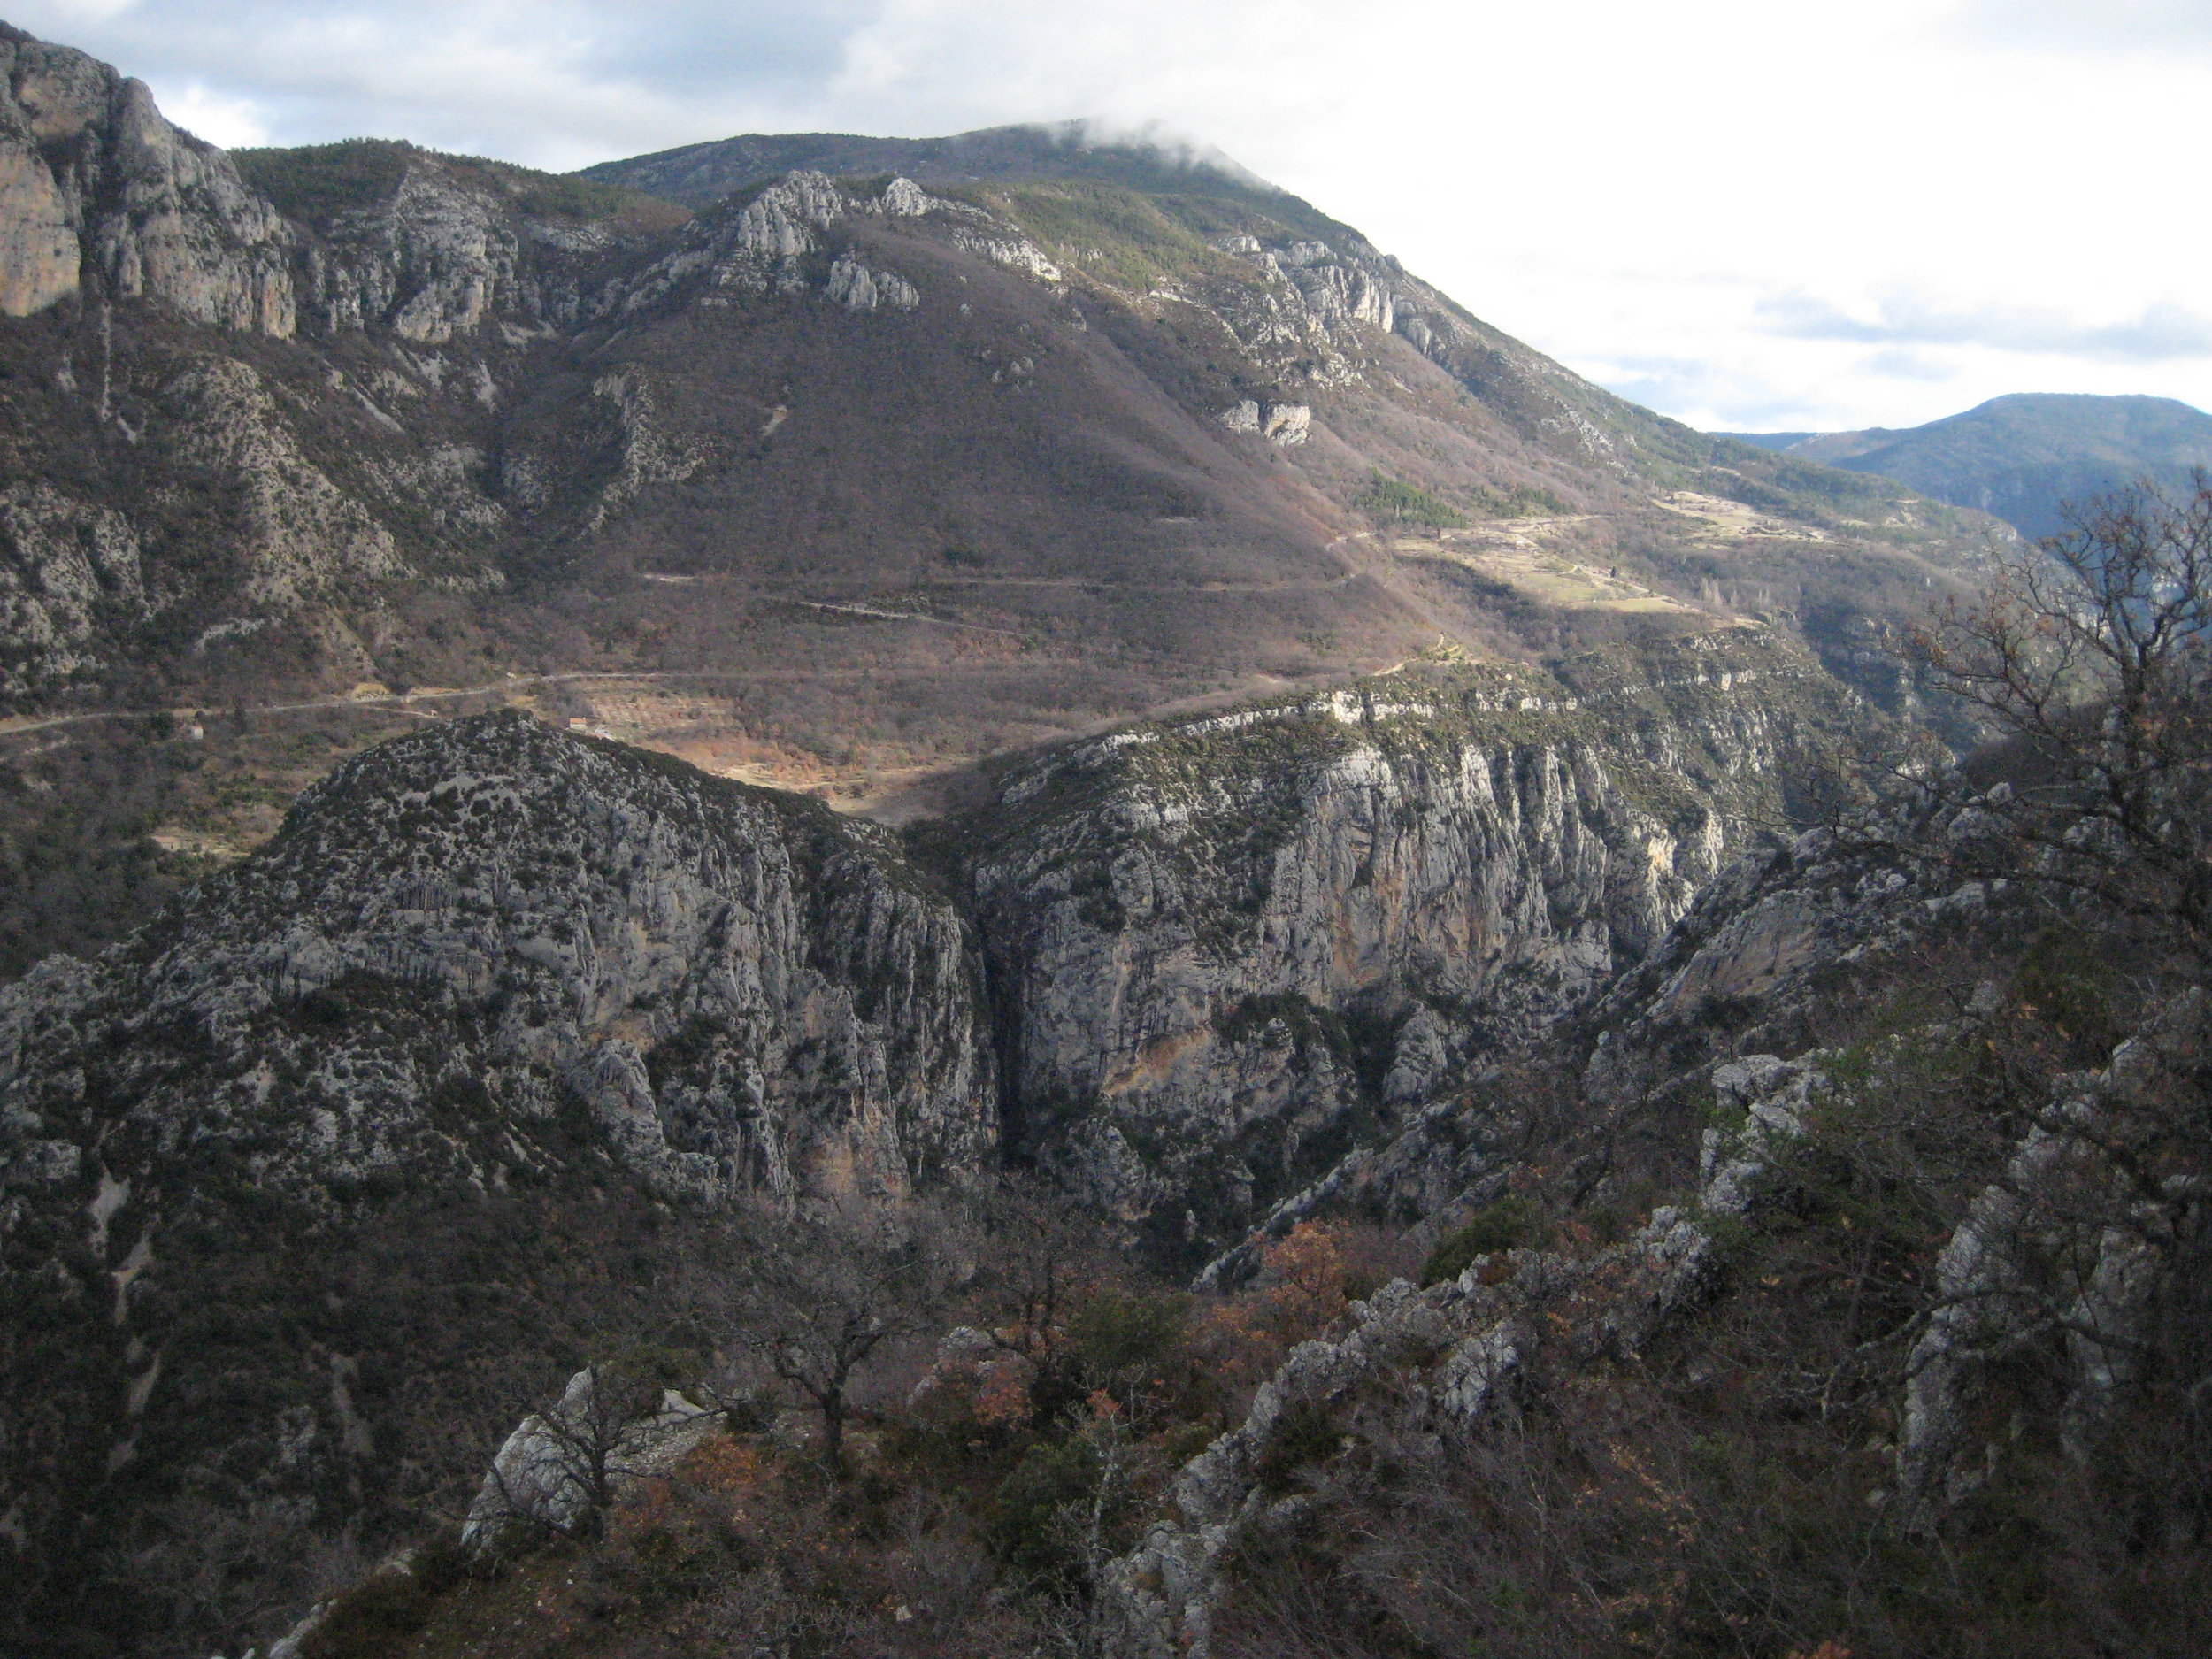 Another view of the  Gorges de Verdon .